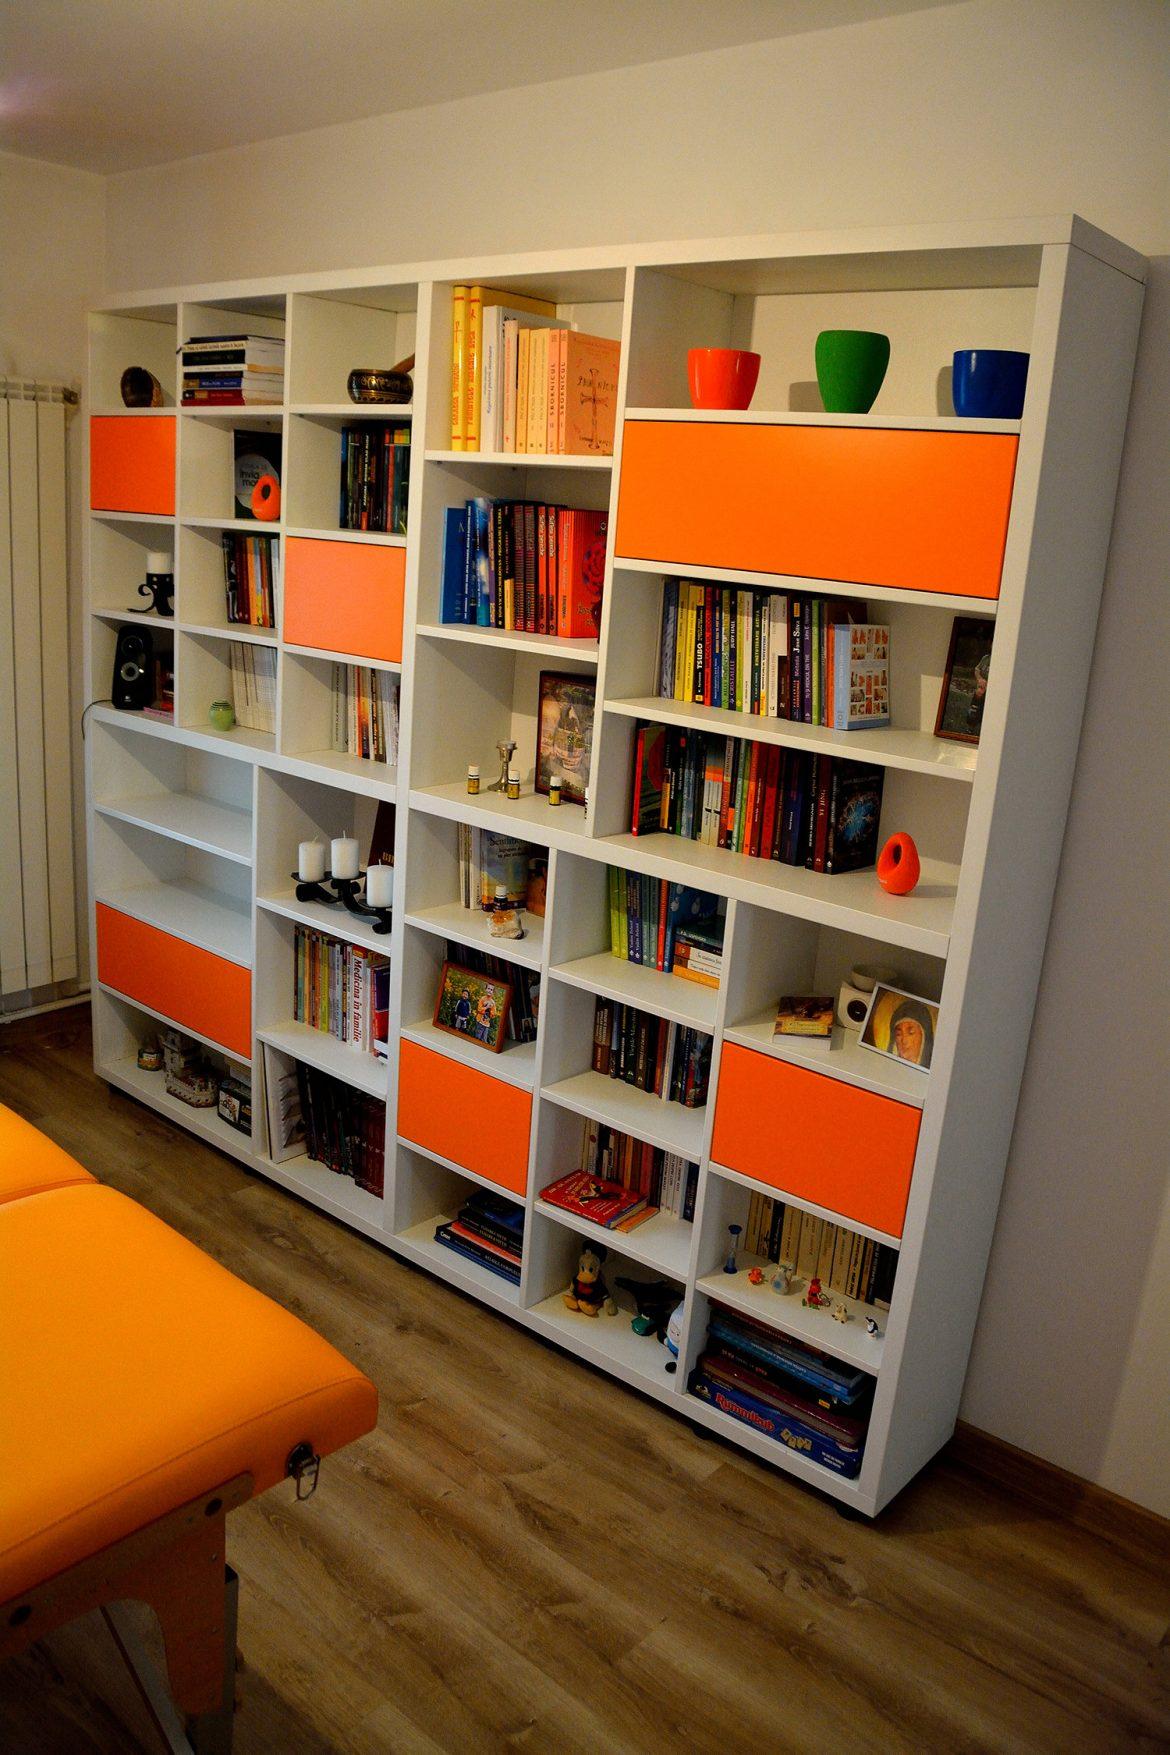 Biblioteca moderna realizata la comanda din pal alb fibros si usi din pal Orange